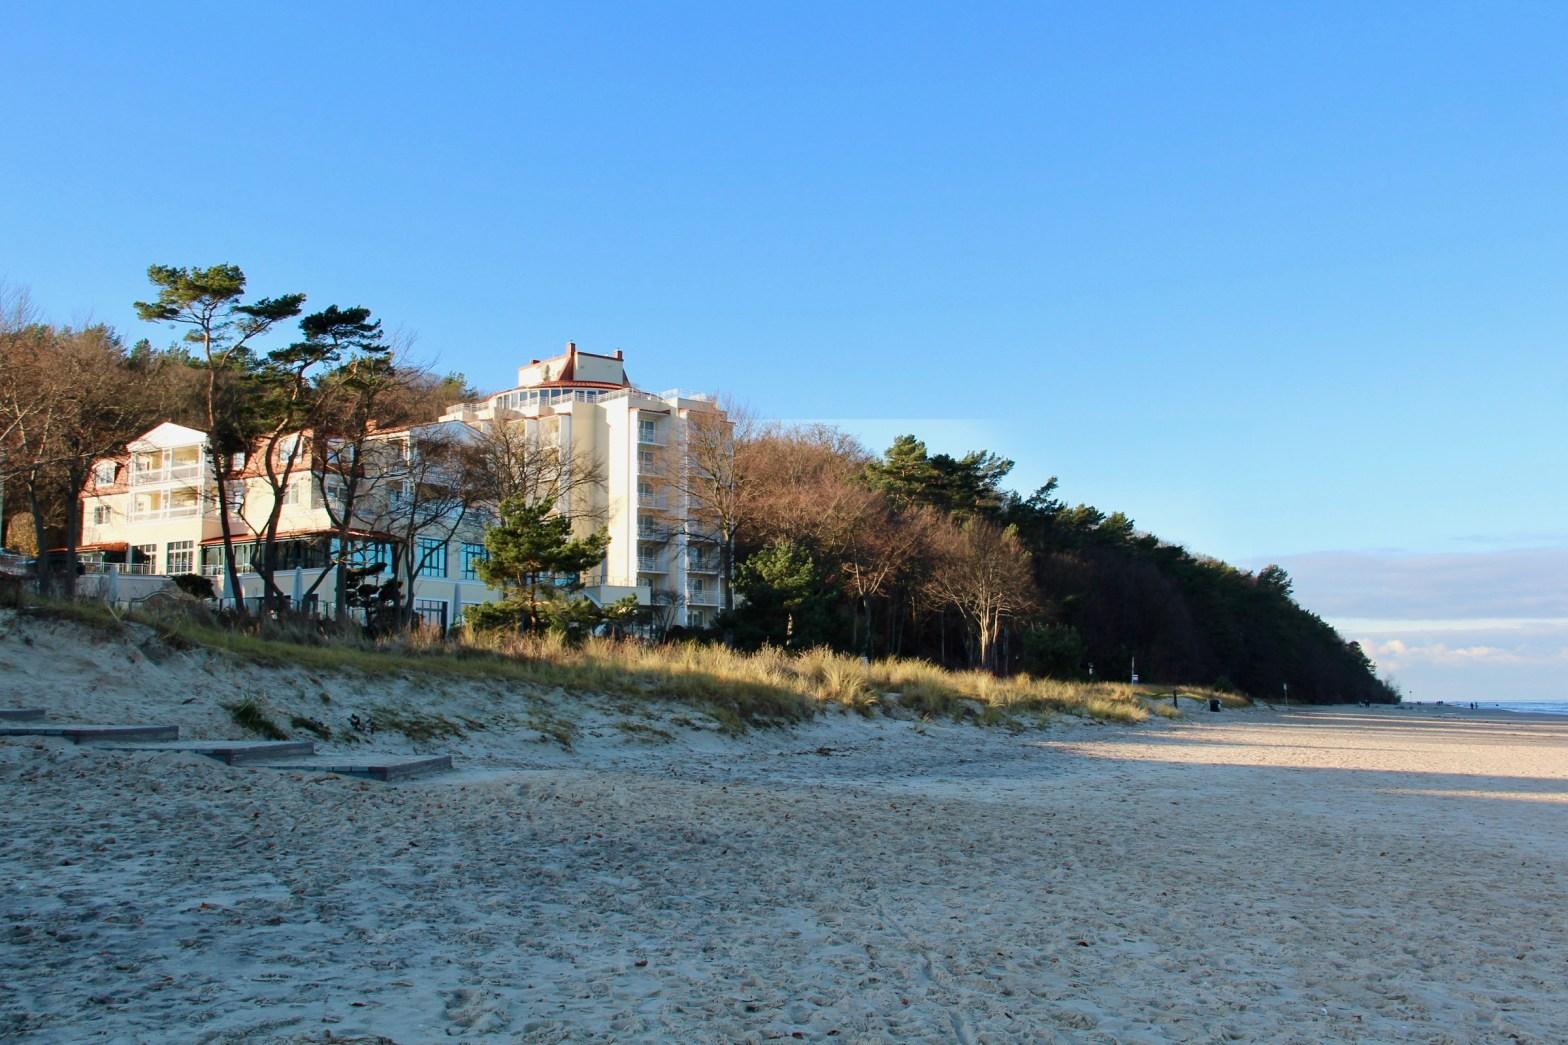 Travel Charme Strandhotel Bansin: Das Familienhotel auf Usedom